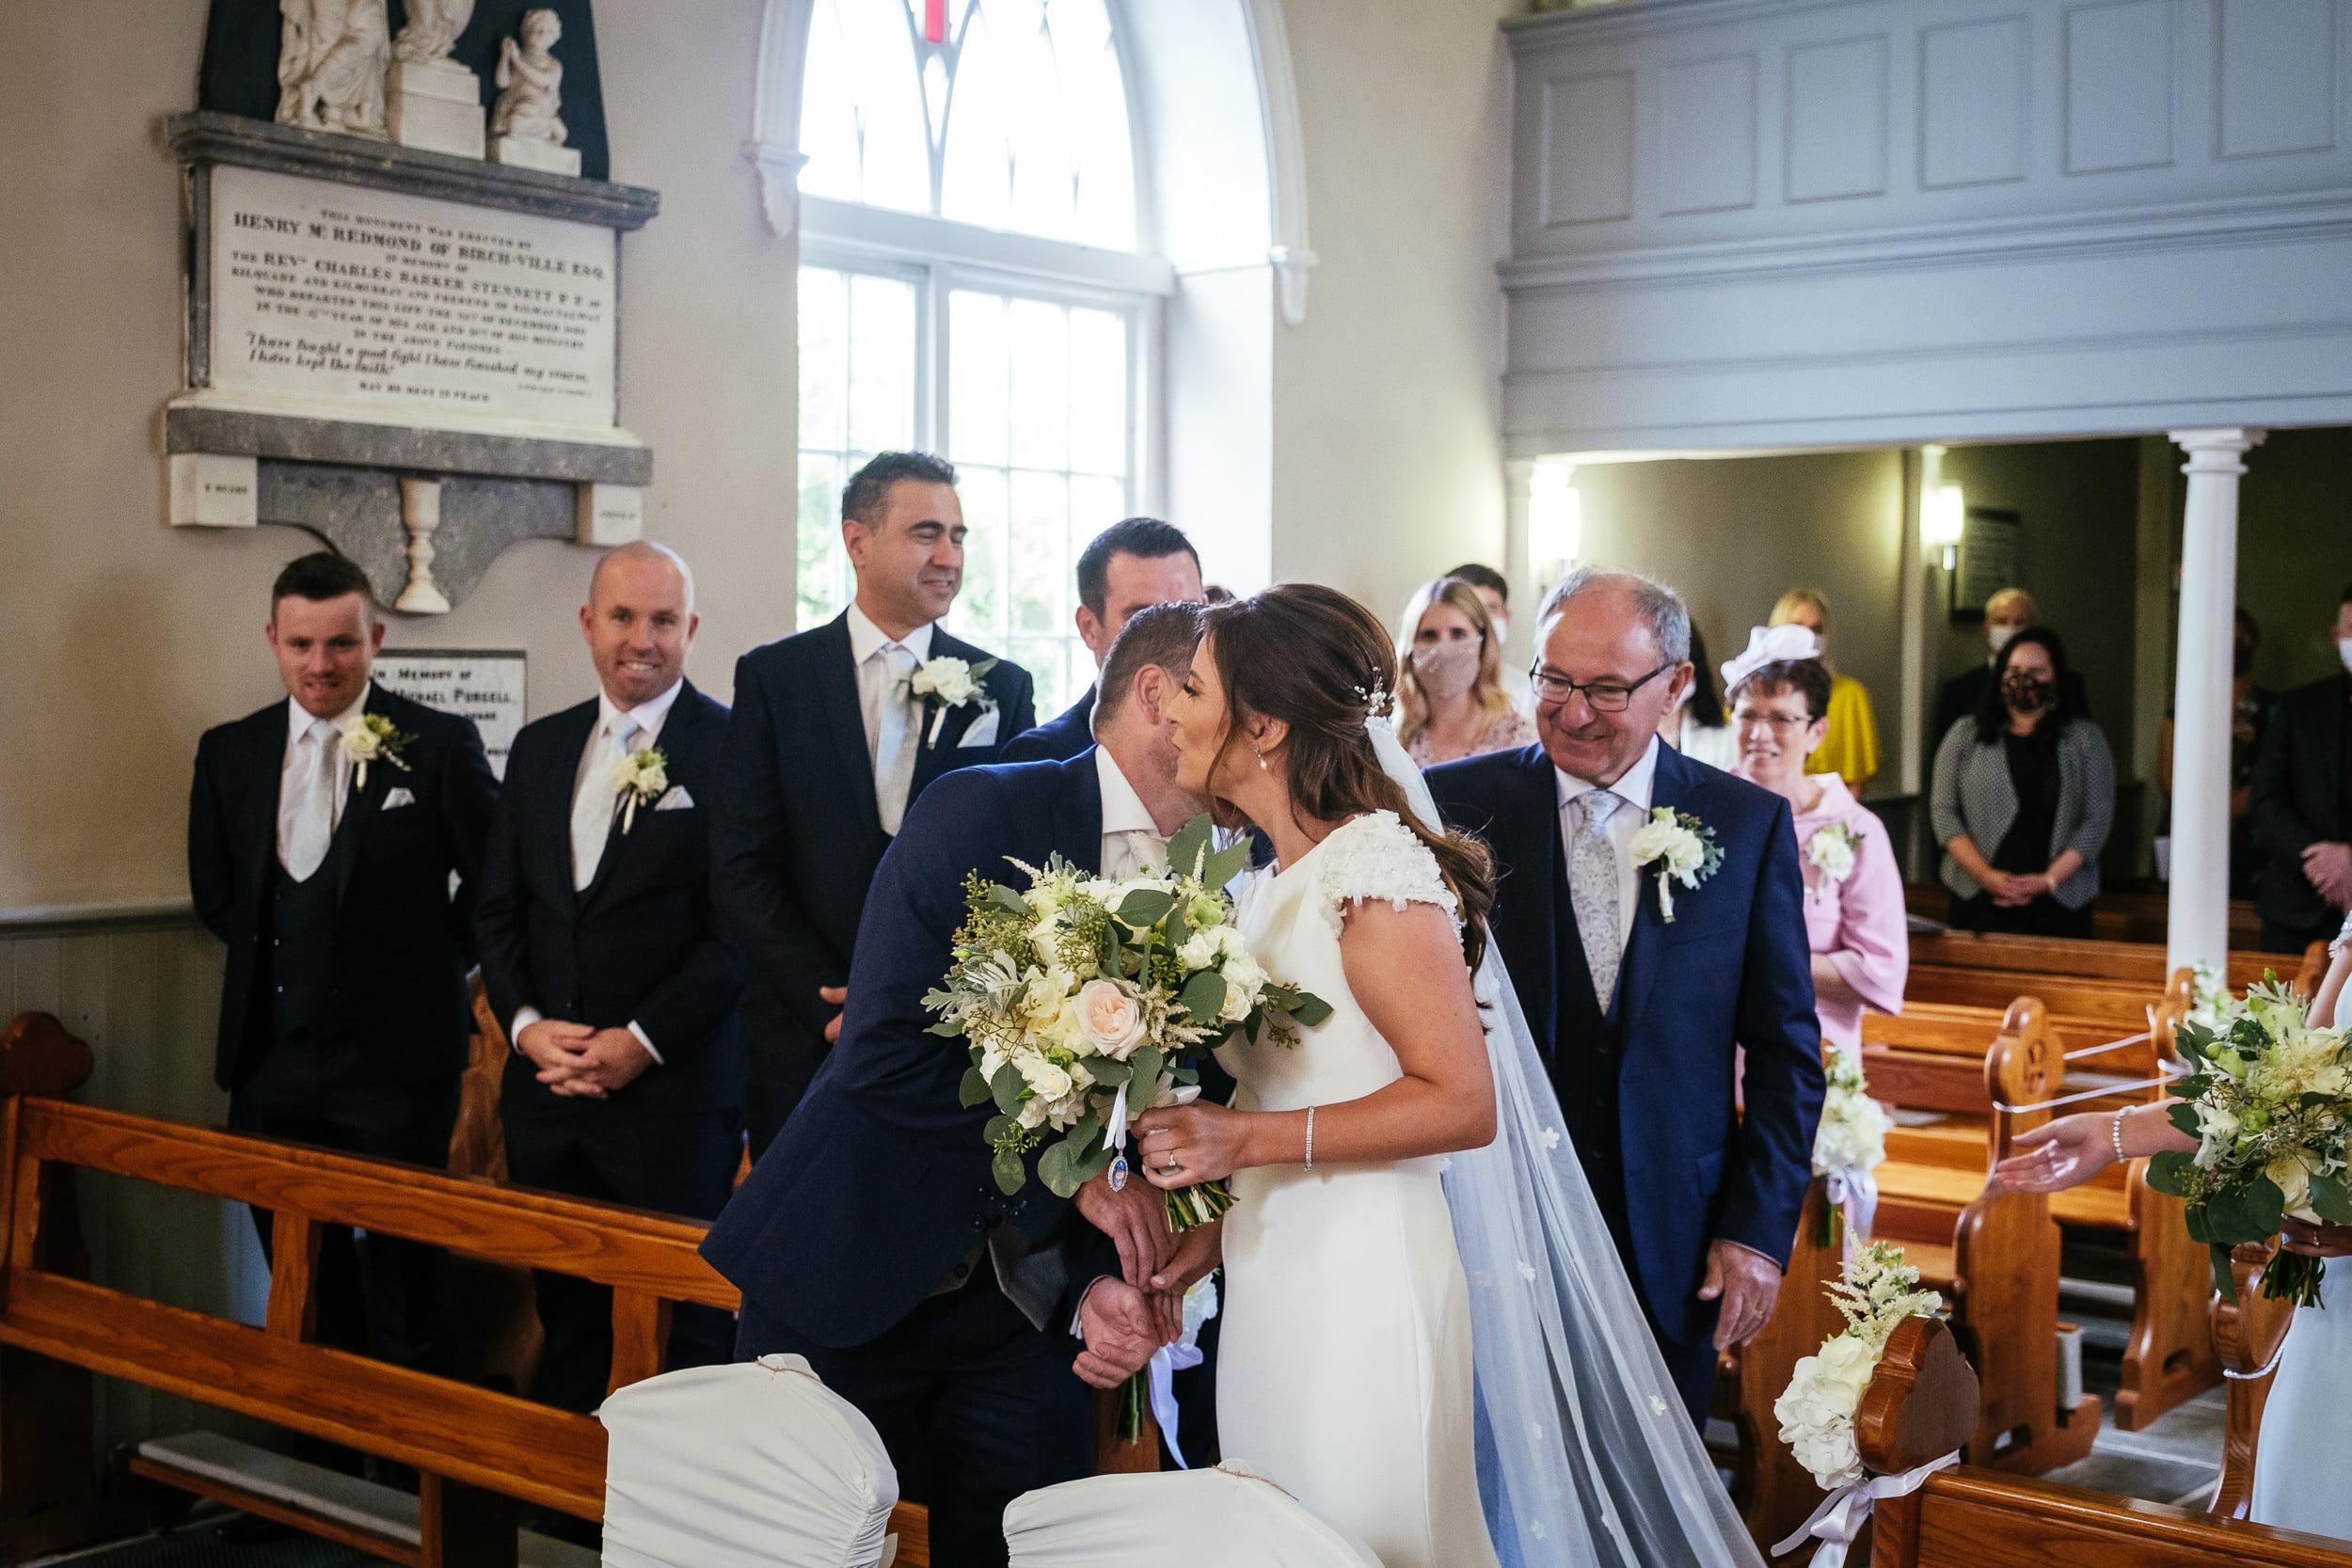 wedding ceremony at St. Patrick's Church, Kilquade